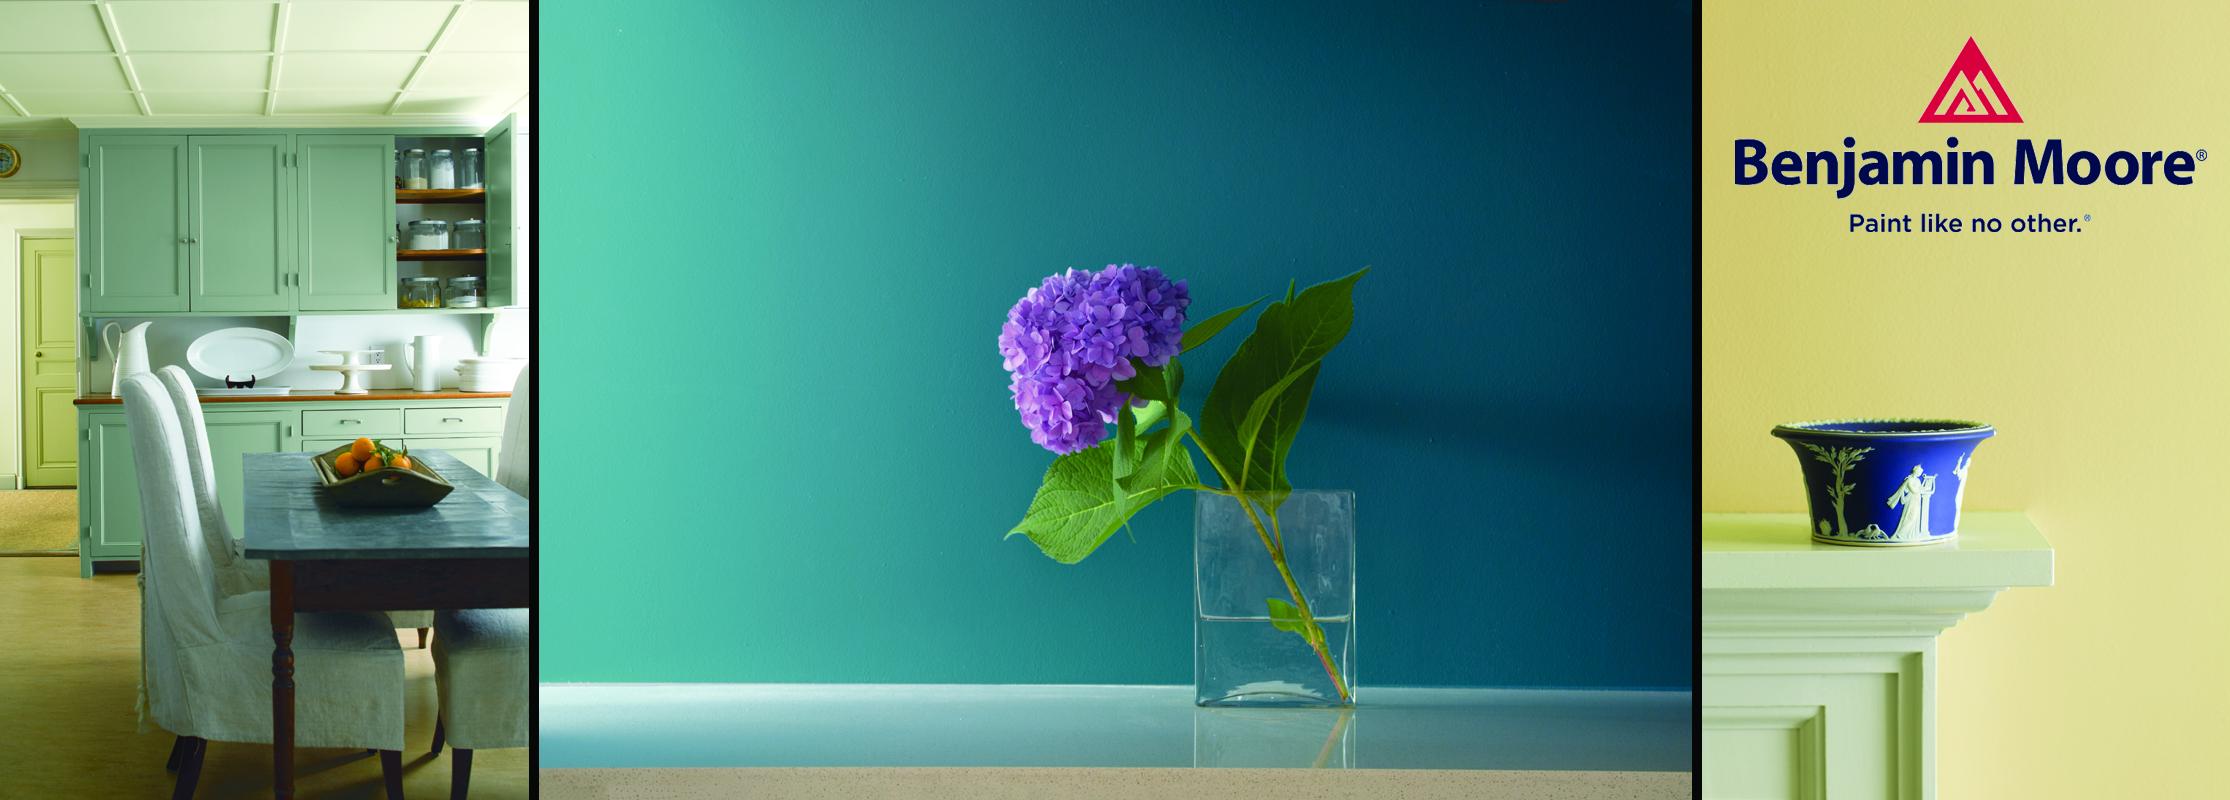 benjamin moore paint suppliers bailey paints ltd. Black Bedroom Furniture Sets. Home Design Ideas